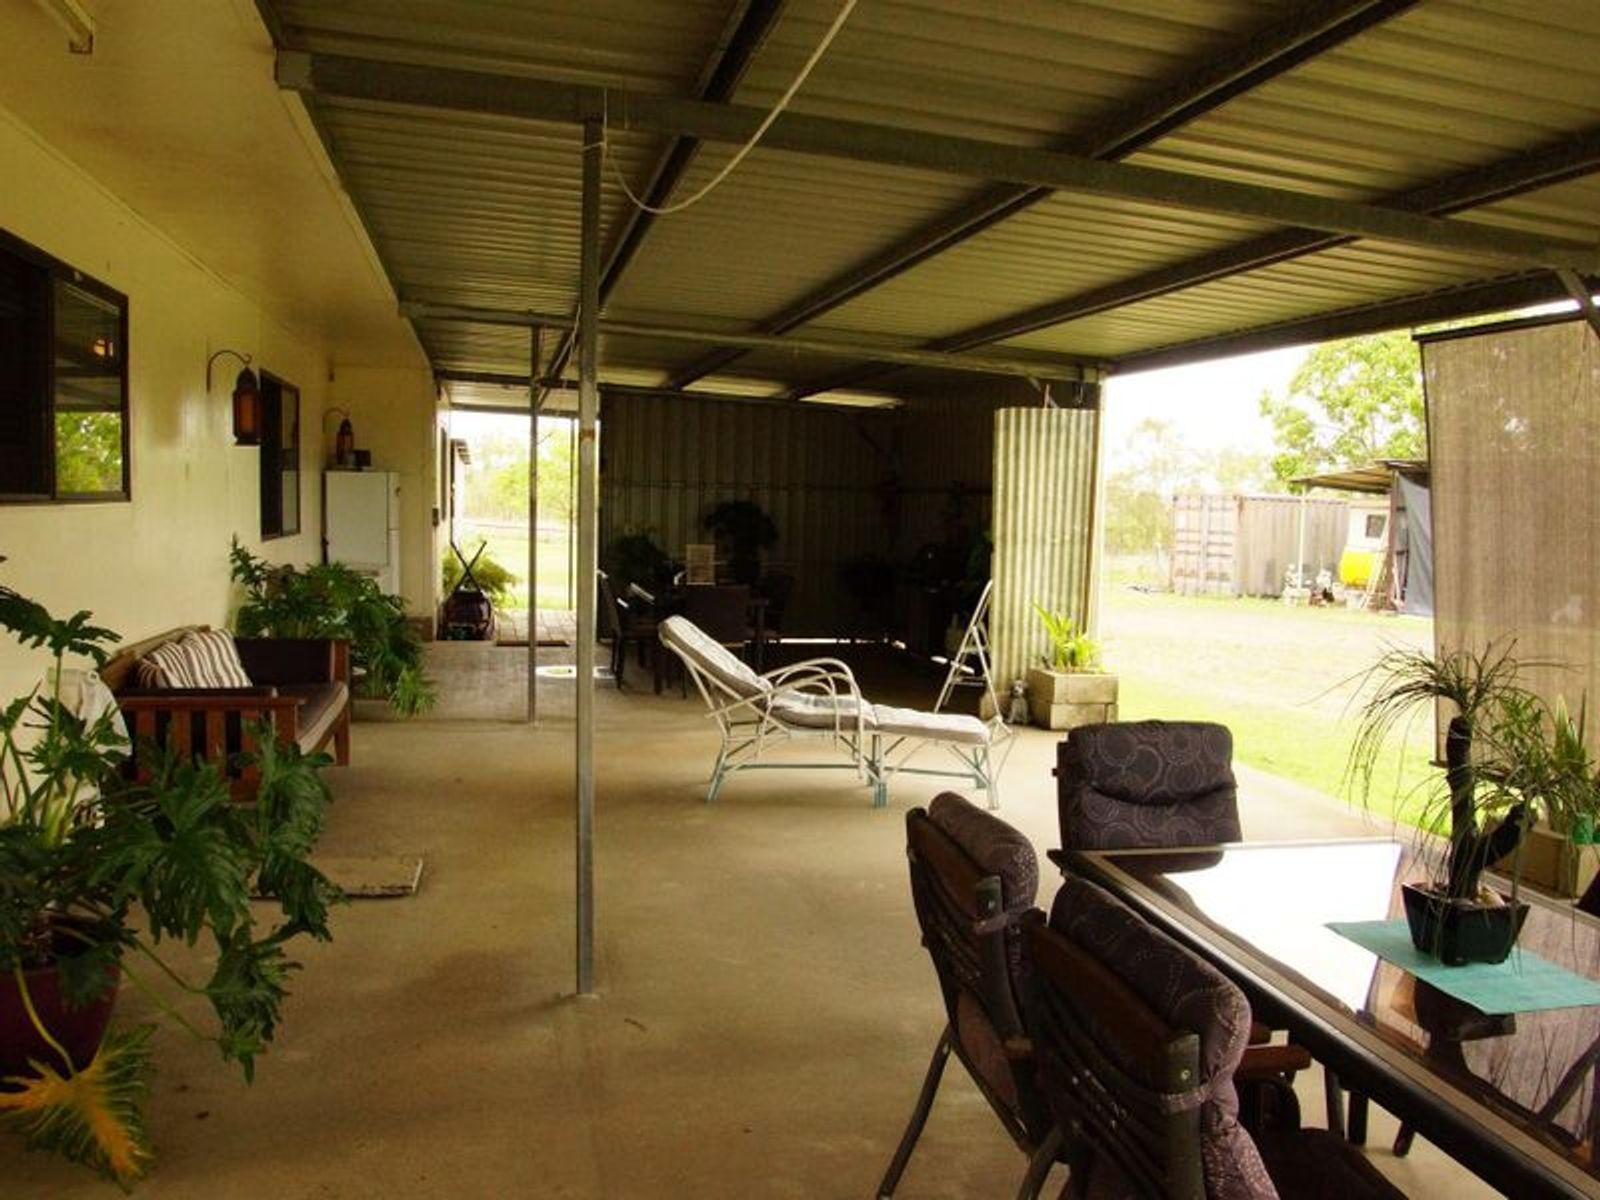 174 Ilbilbie Road, Ilbilbie, QLD 4738